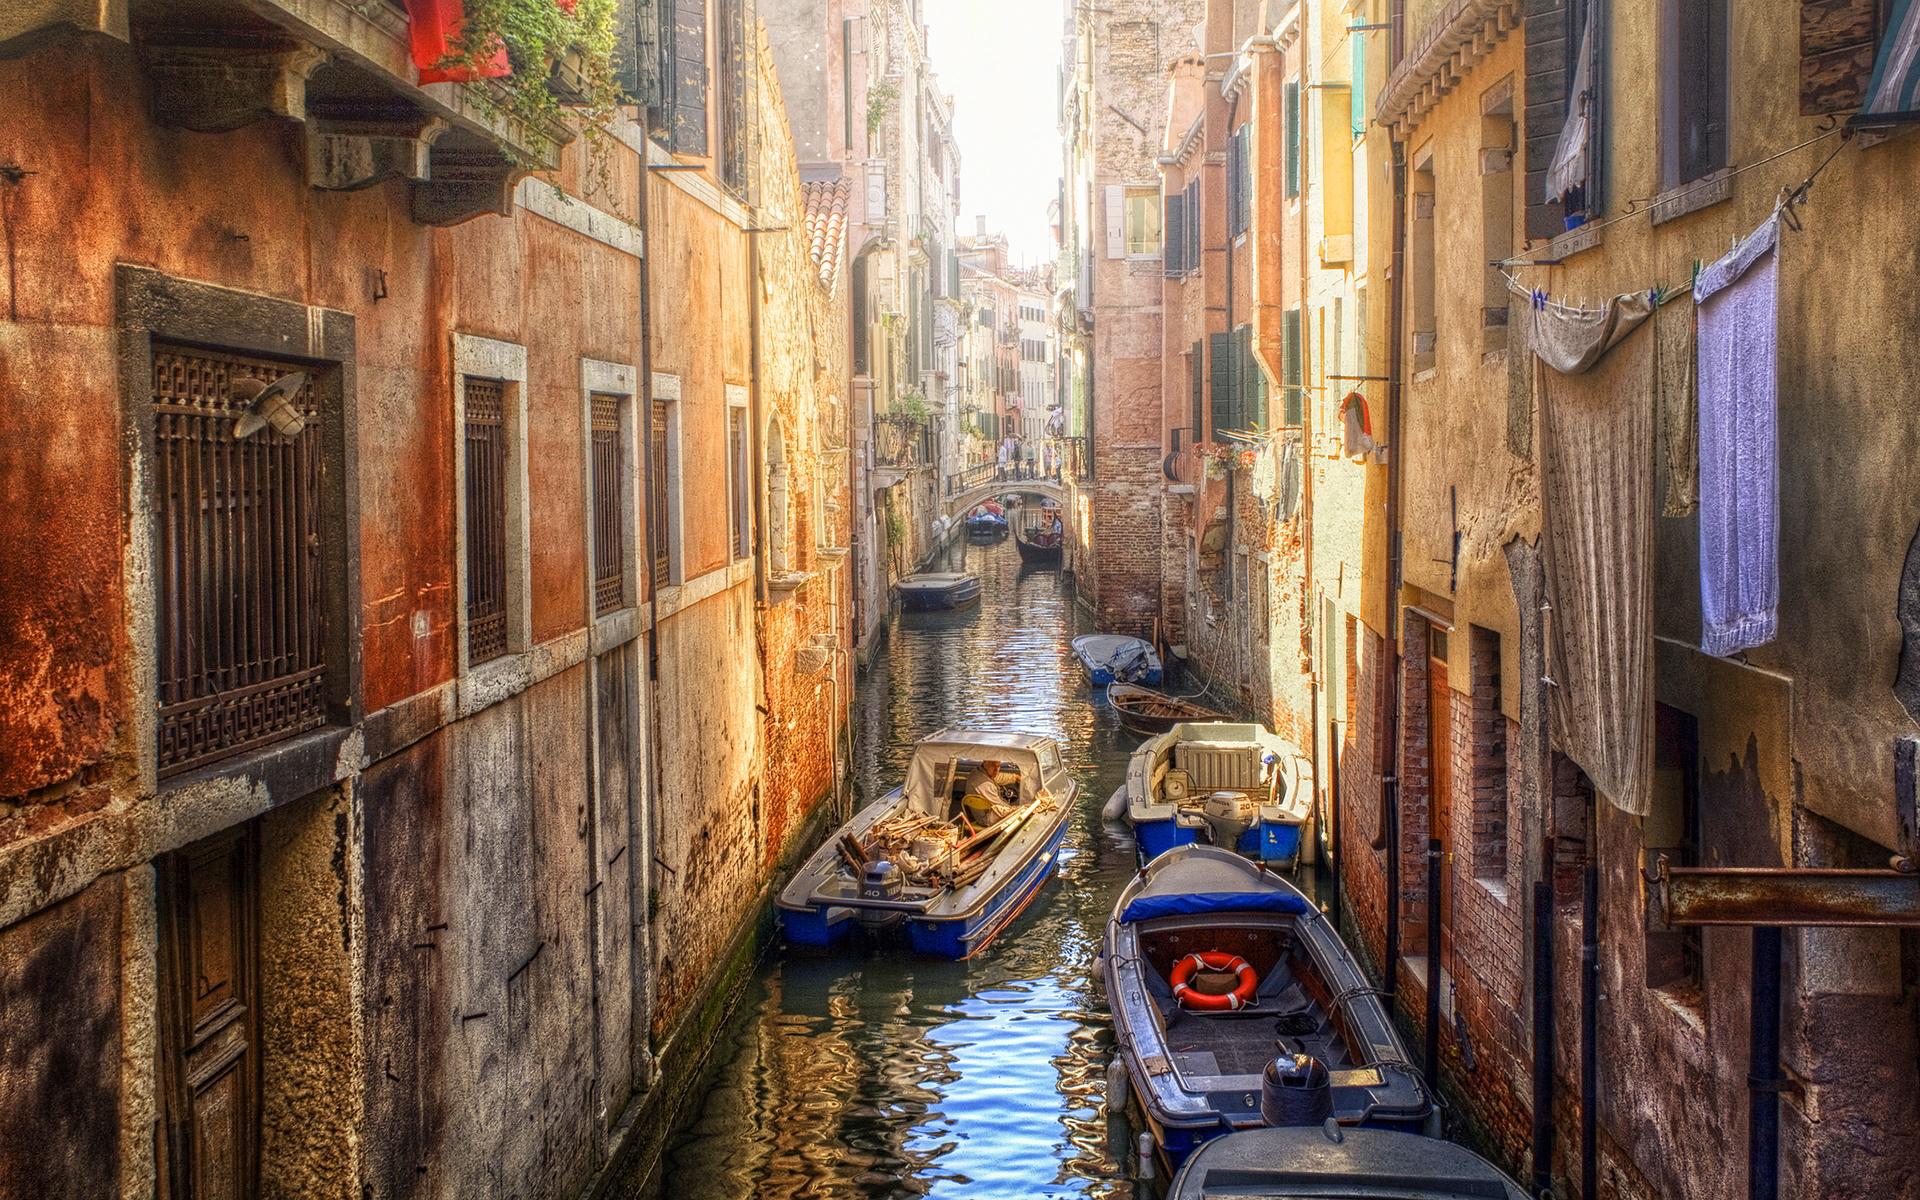 Venice boats buildings